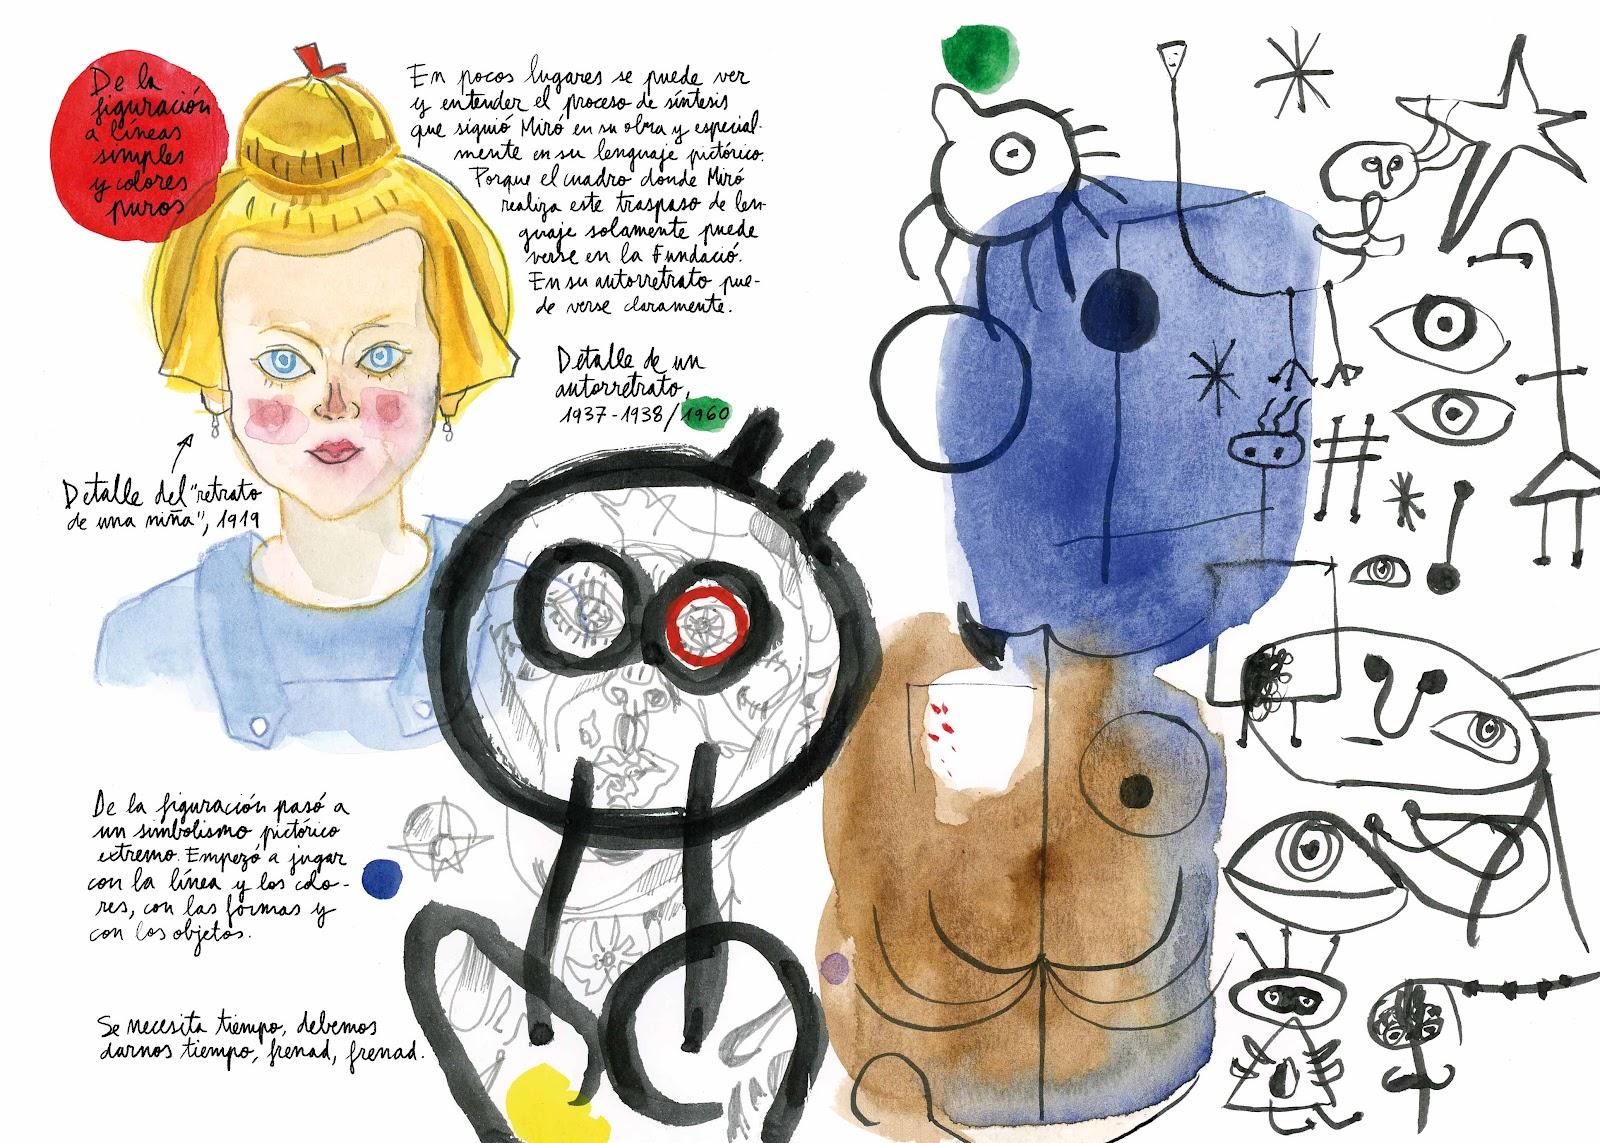 Pushing How to Look - PYSB Sevilla 2018 | Urban Sketchers